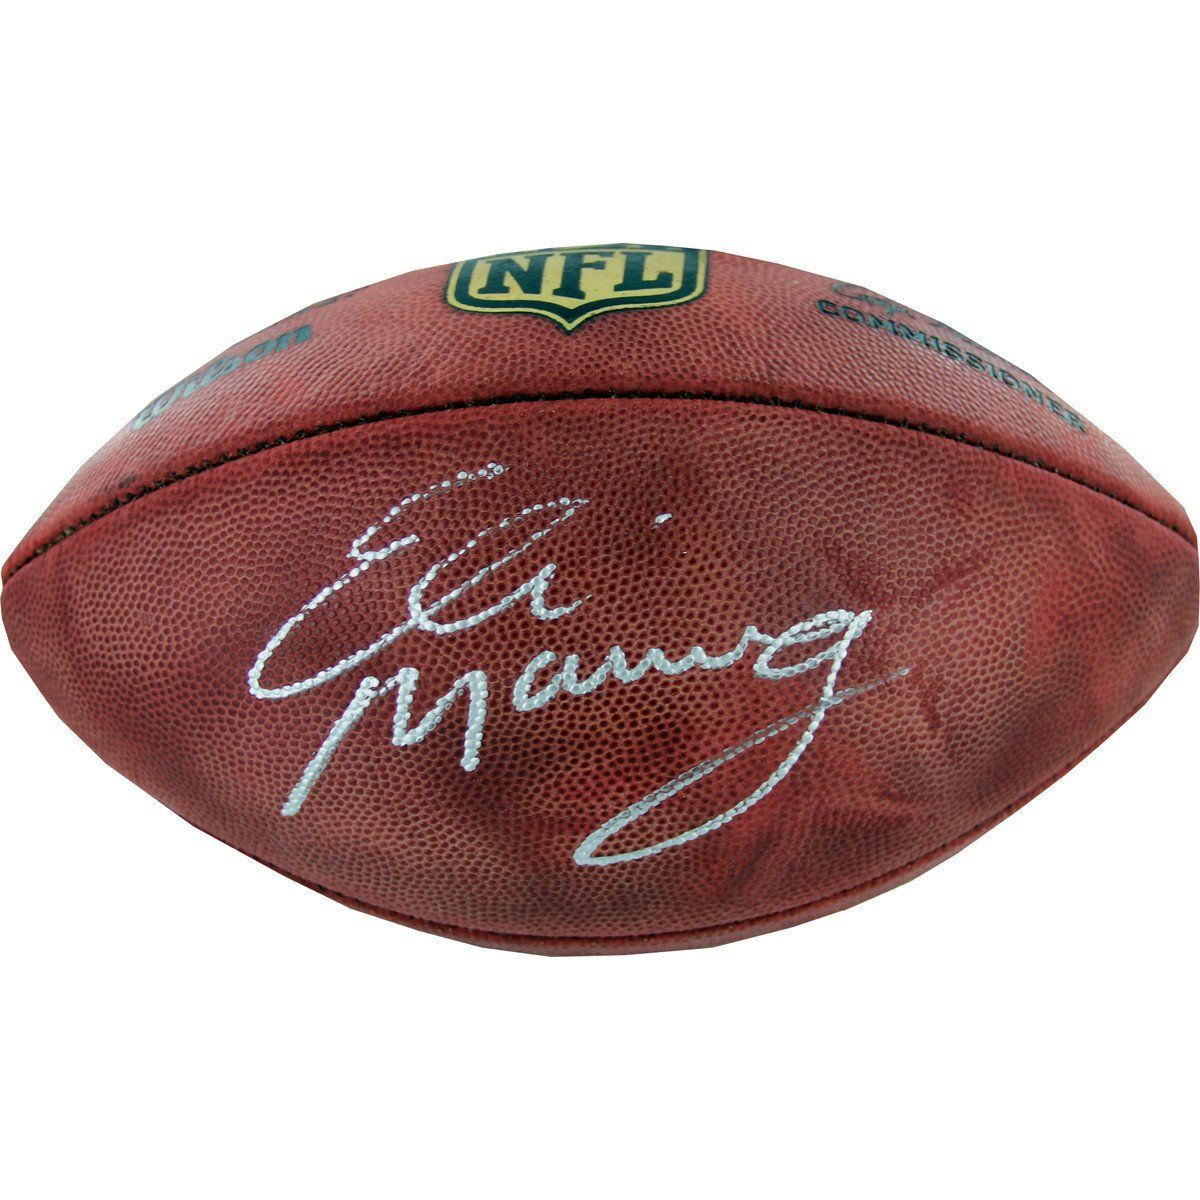 Nick Foles Philadelphia Eagles Autographed Wilson Super